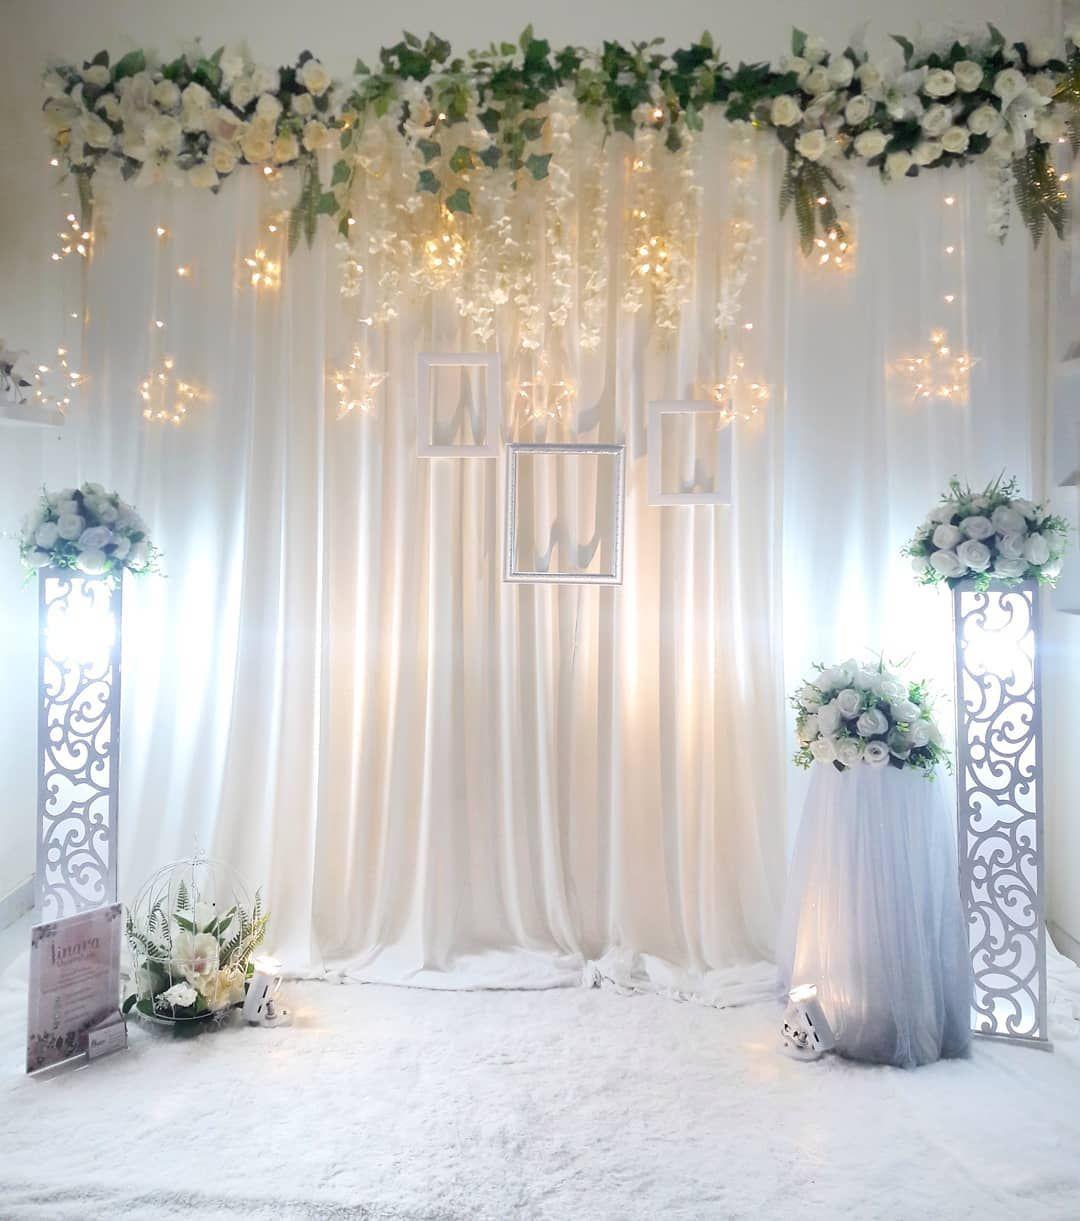 Wedding decorations backdrop  Pelamin backdrop  Engagement inspo  Pinterest  Backdrops Wedding